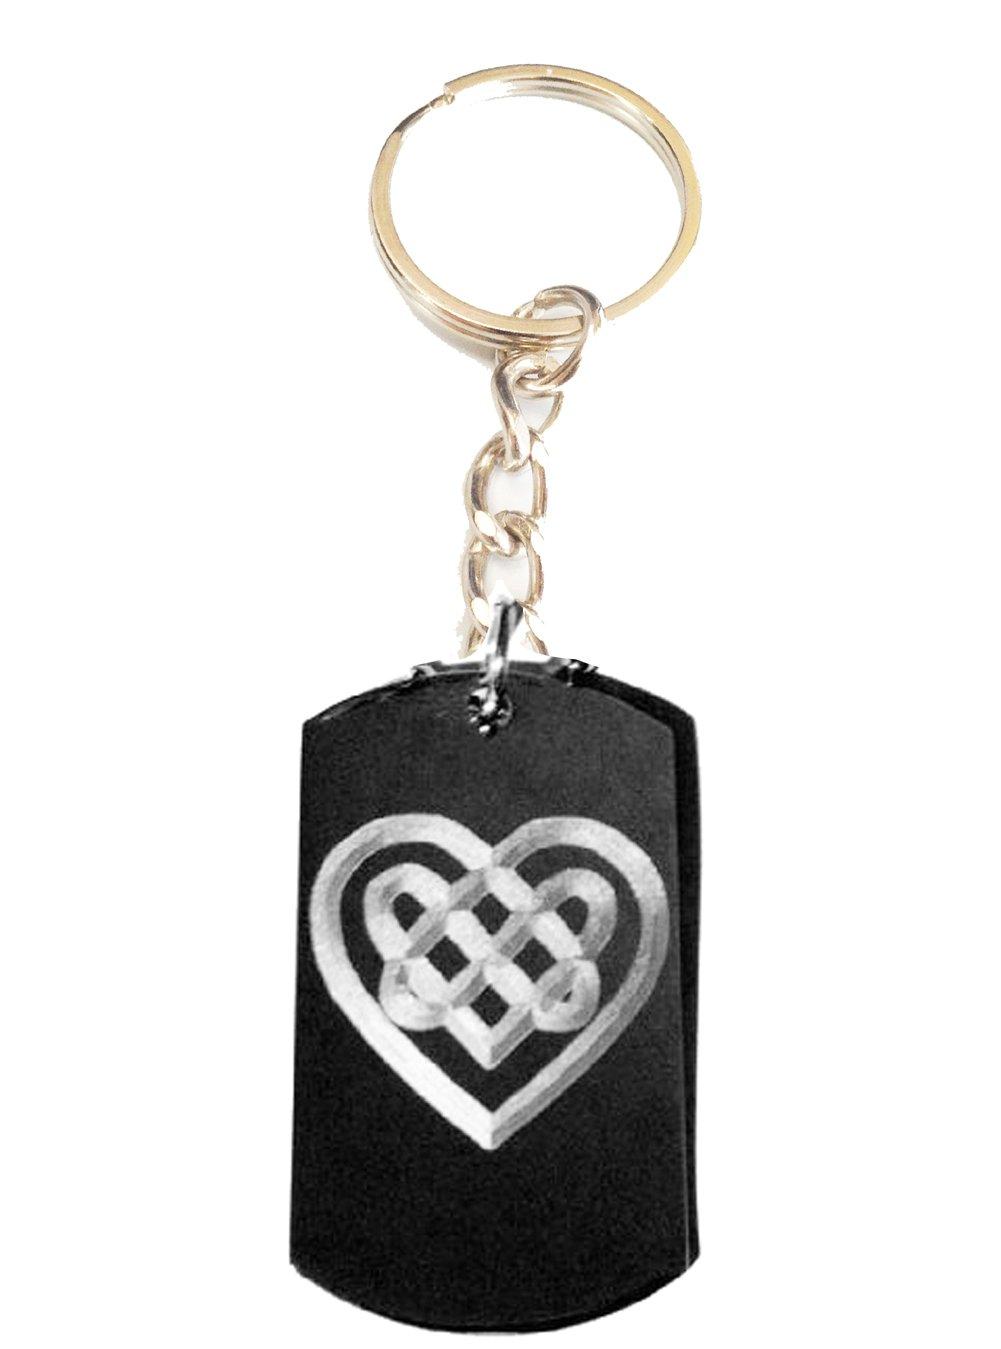 Celtic Irish Knot Heart Tattoo Logo Symbols Metal Ring Key Chain Keychain